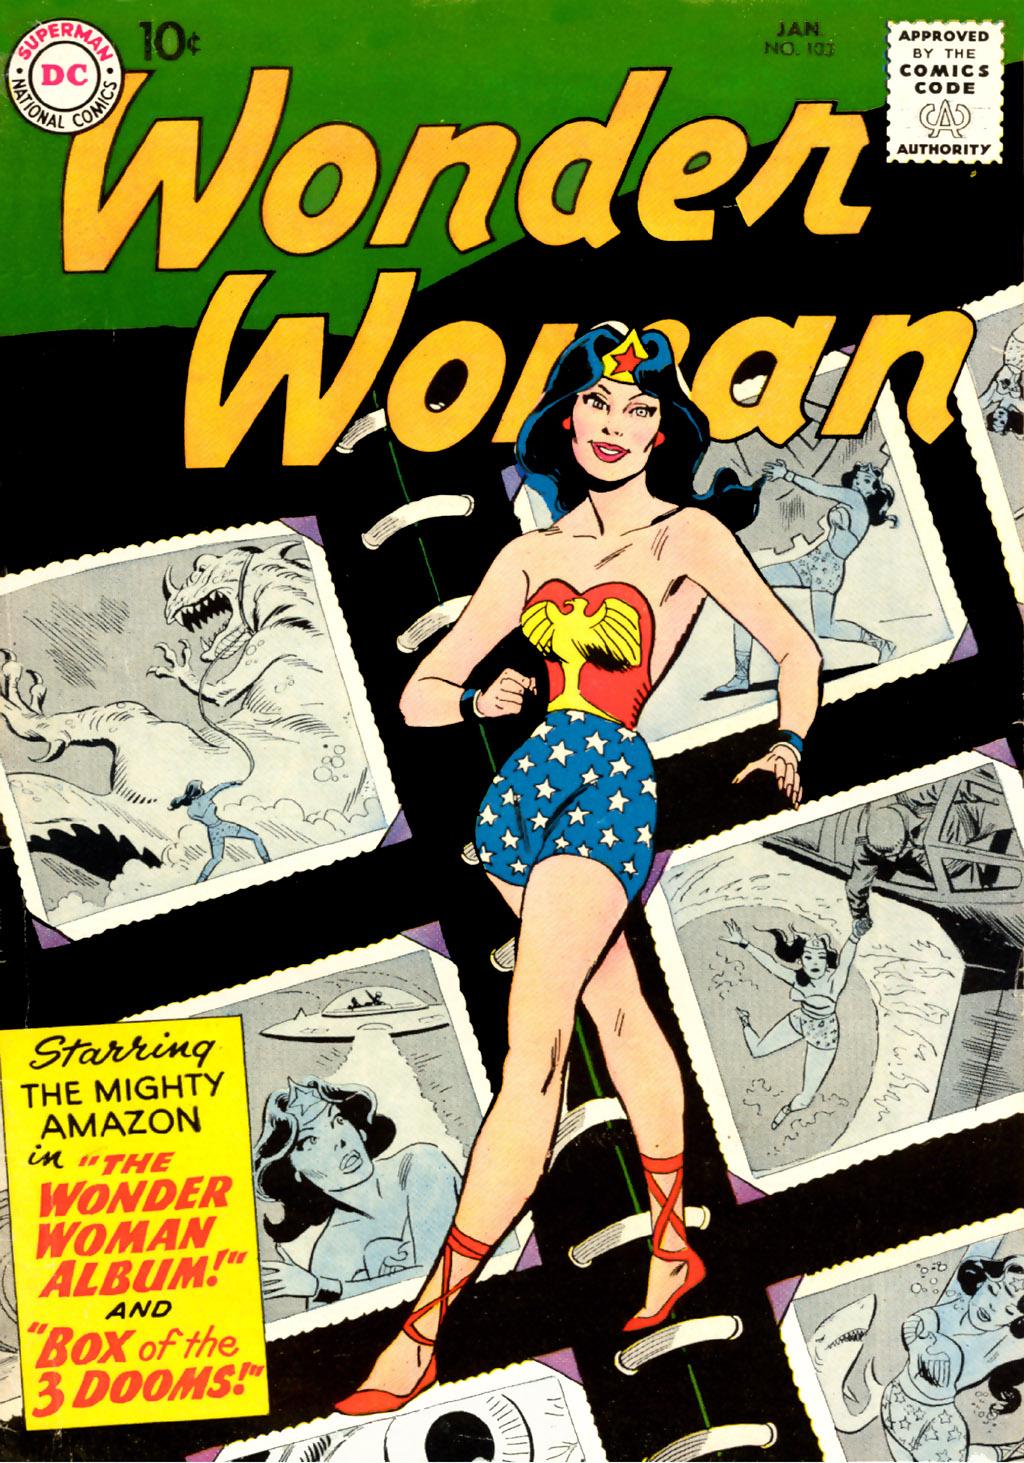 Read online Wonder Woman (1942) comic -  Issue #103 - 1